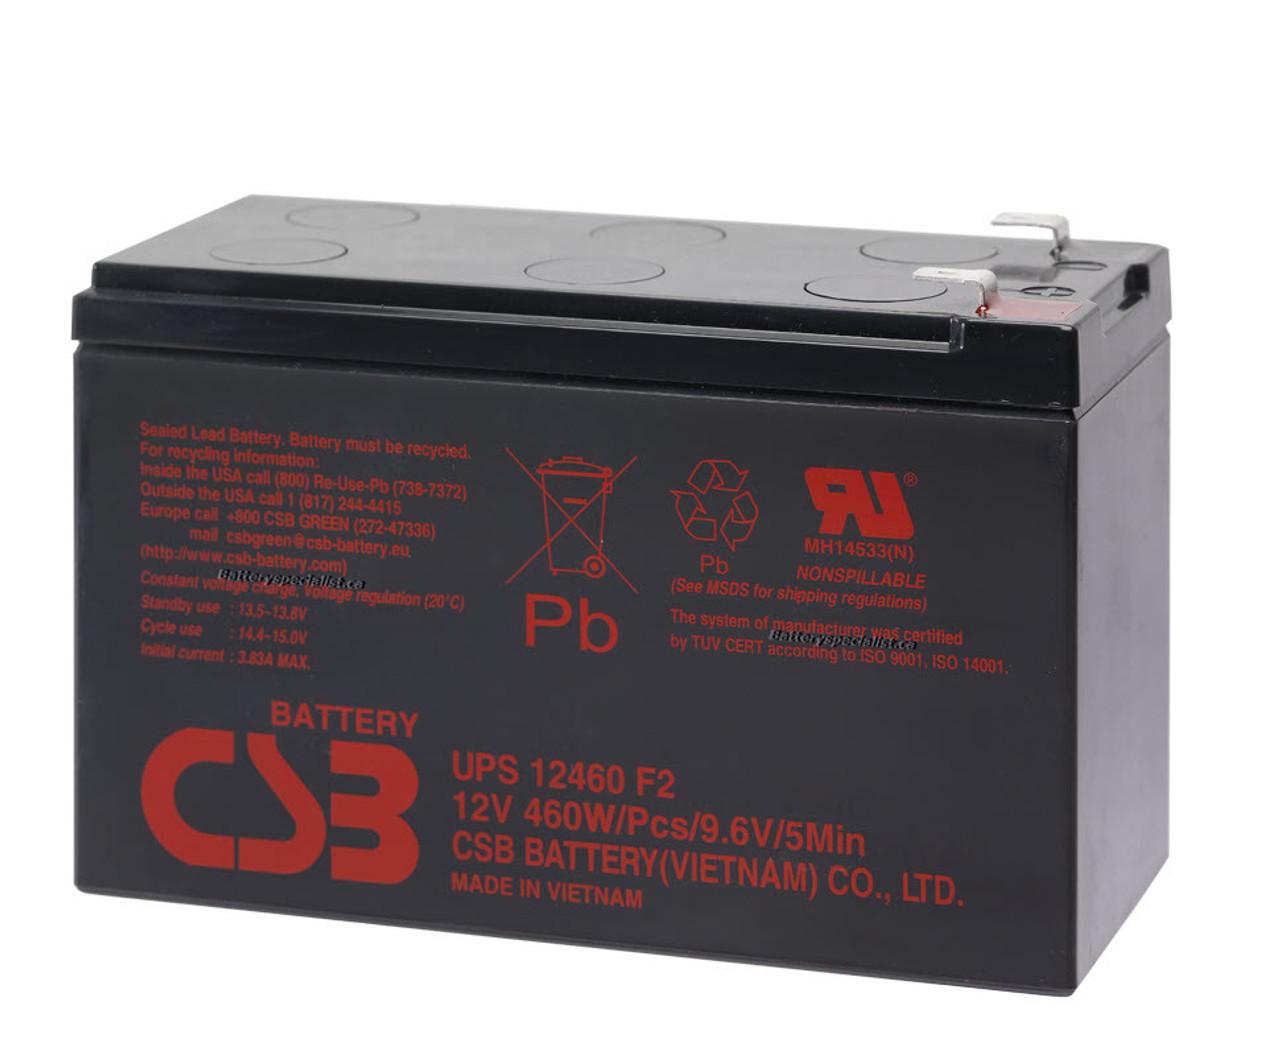 Liebert PS1000RT3-120XR Replacement Battery Pack Rechargeable, high Rate